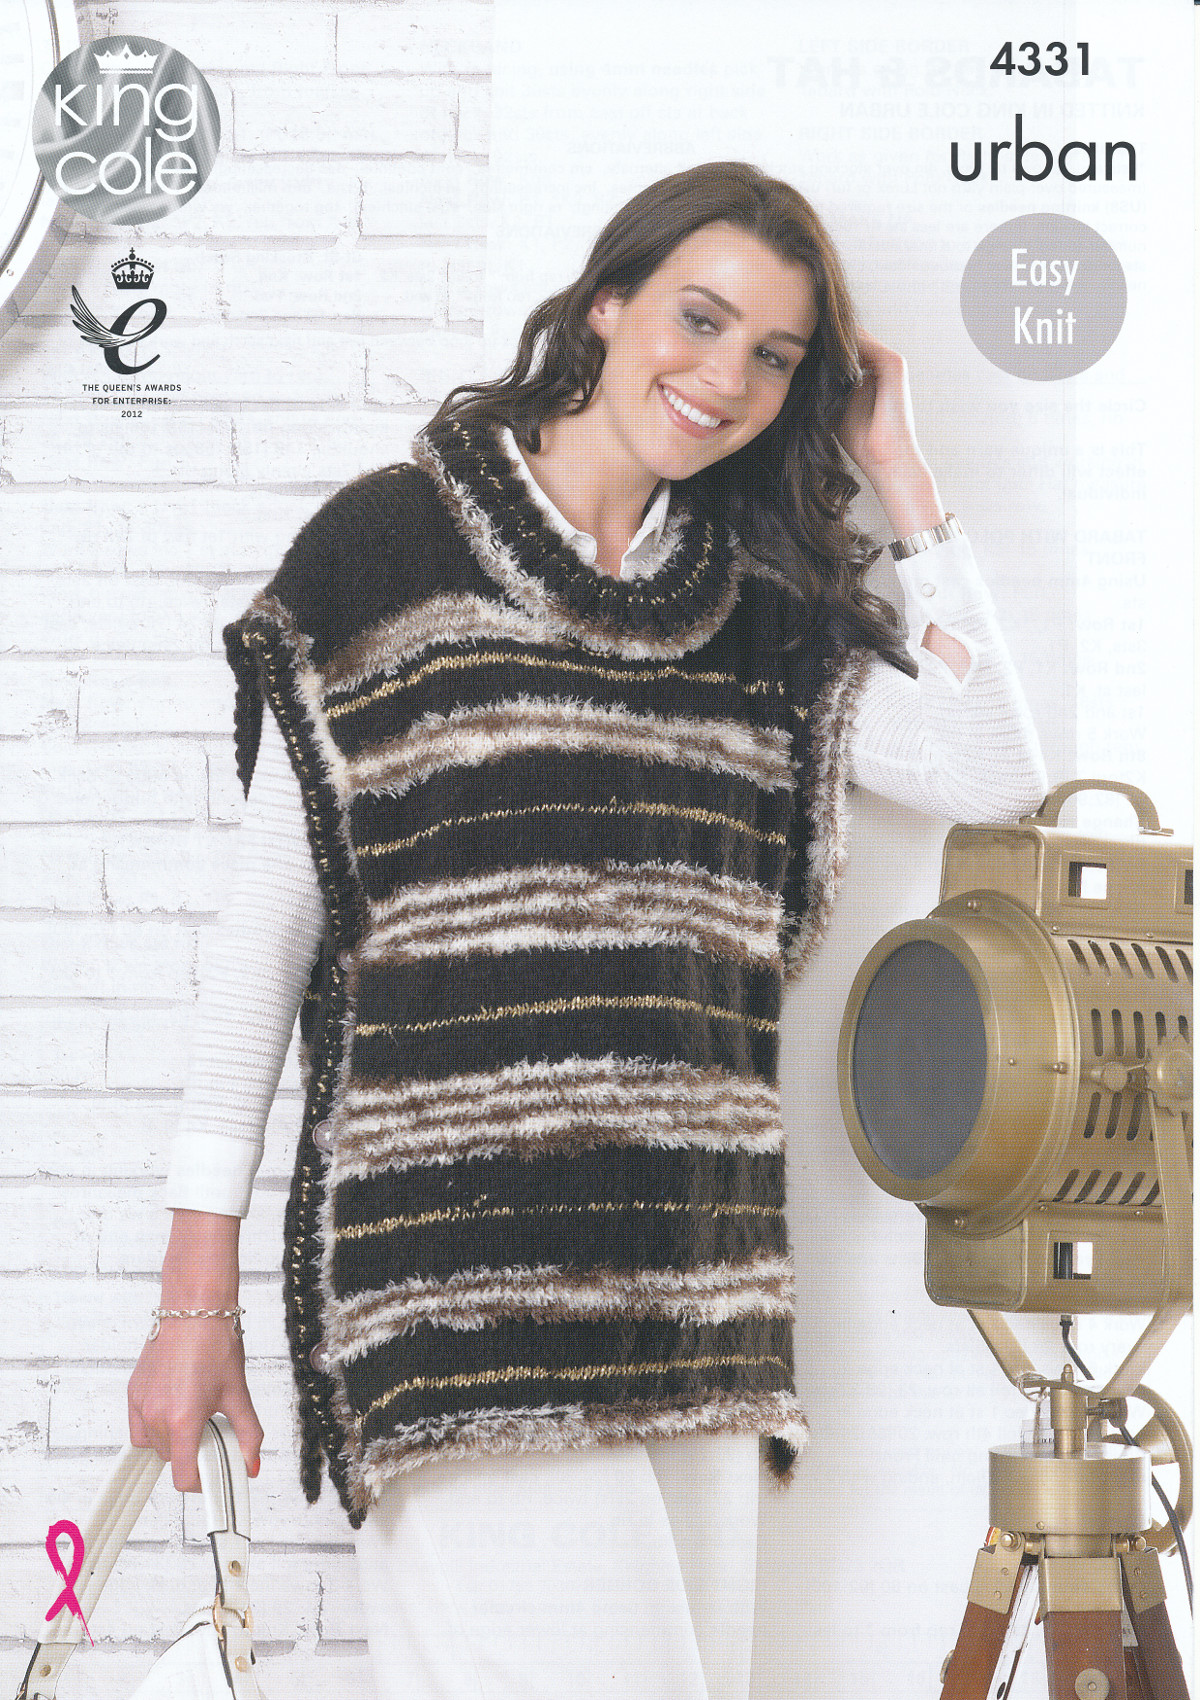 Womens Knitting Pattern King Cole Urban Easy Knit Cap Sleeve Tabards & Ha...